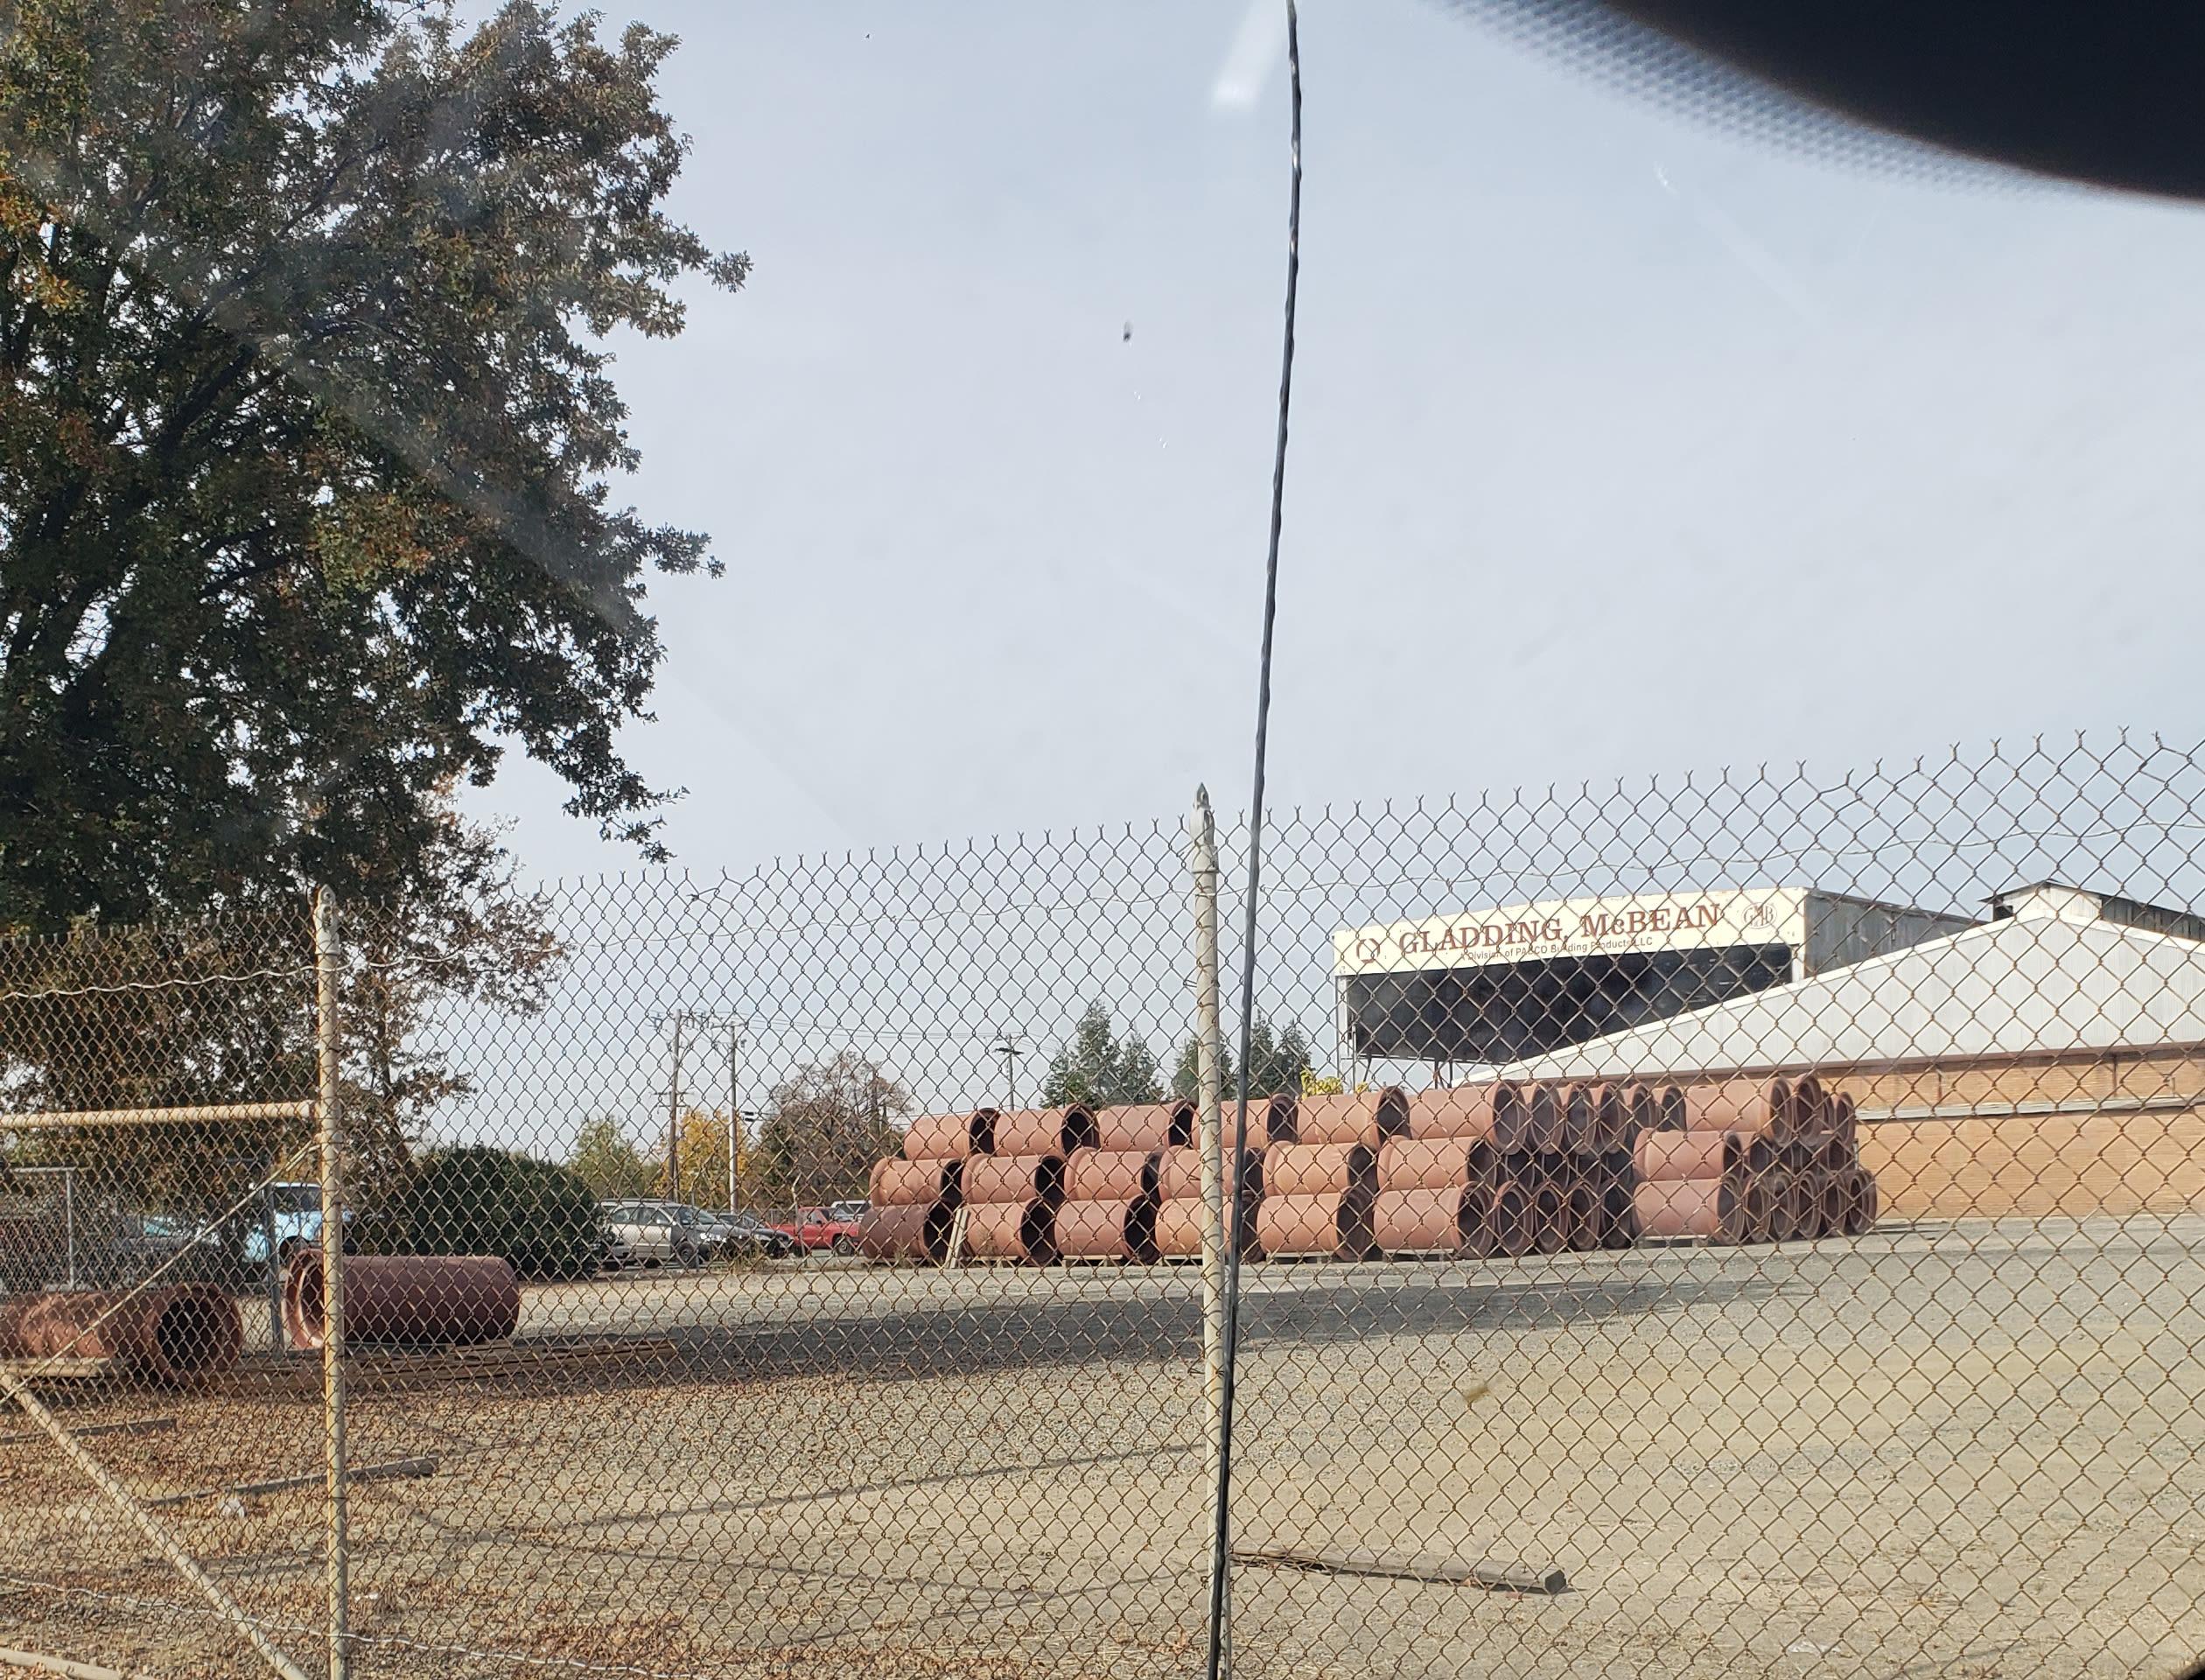 Gladding McBean Facility Lincoln California